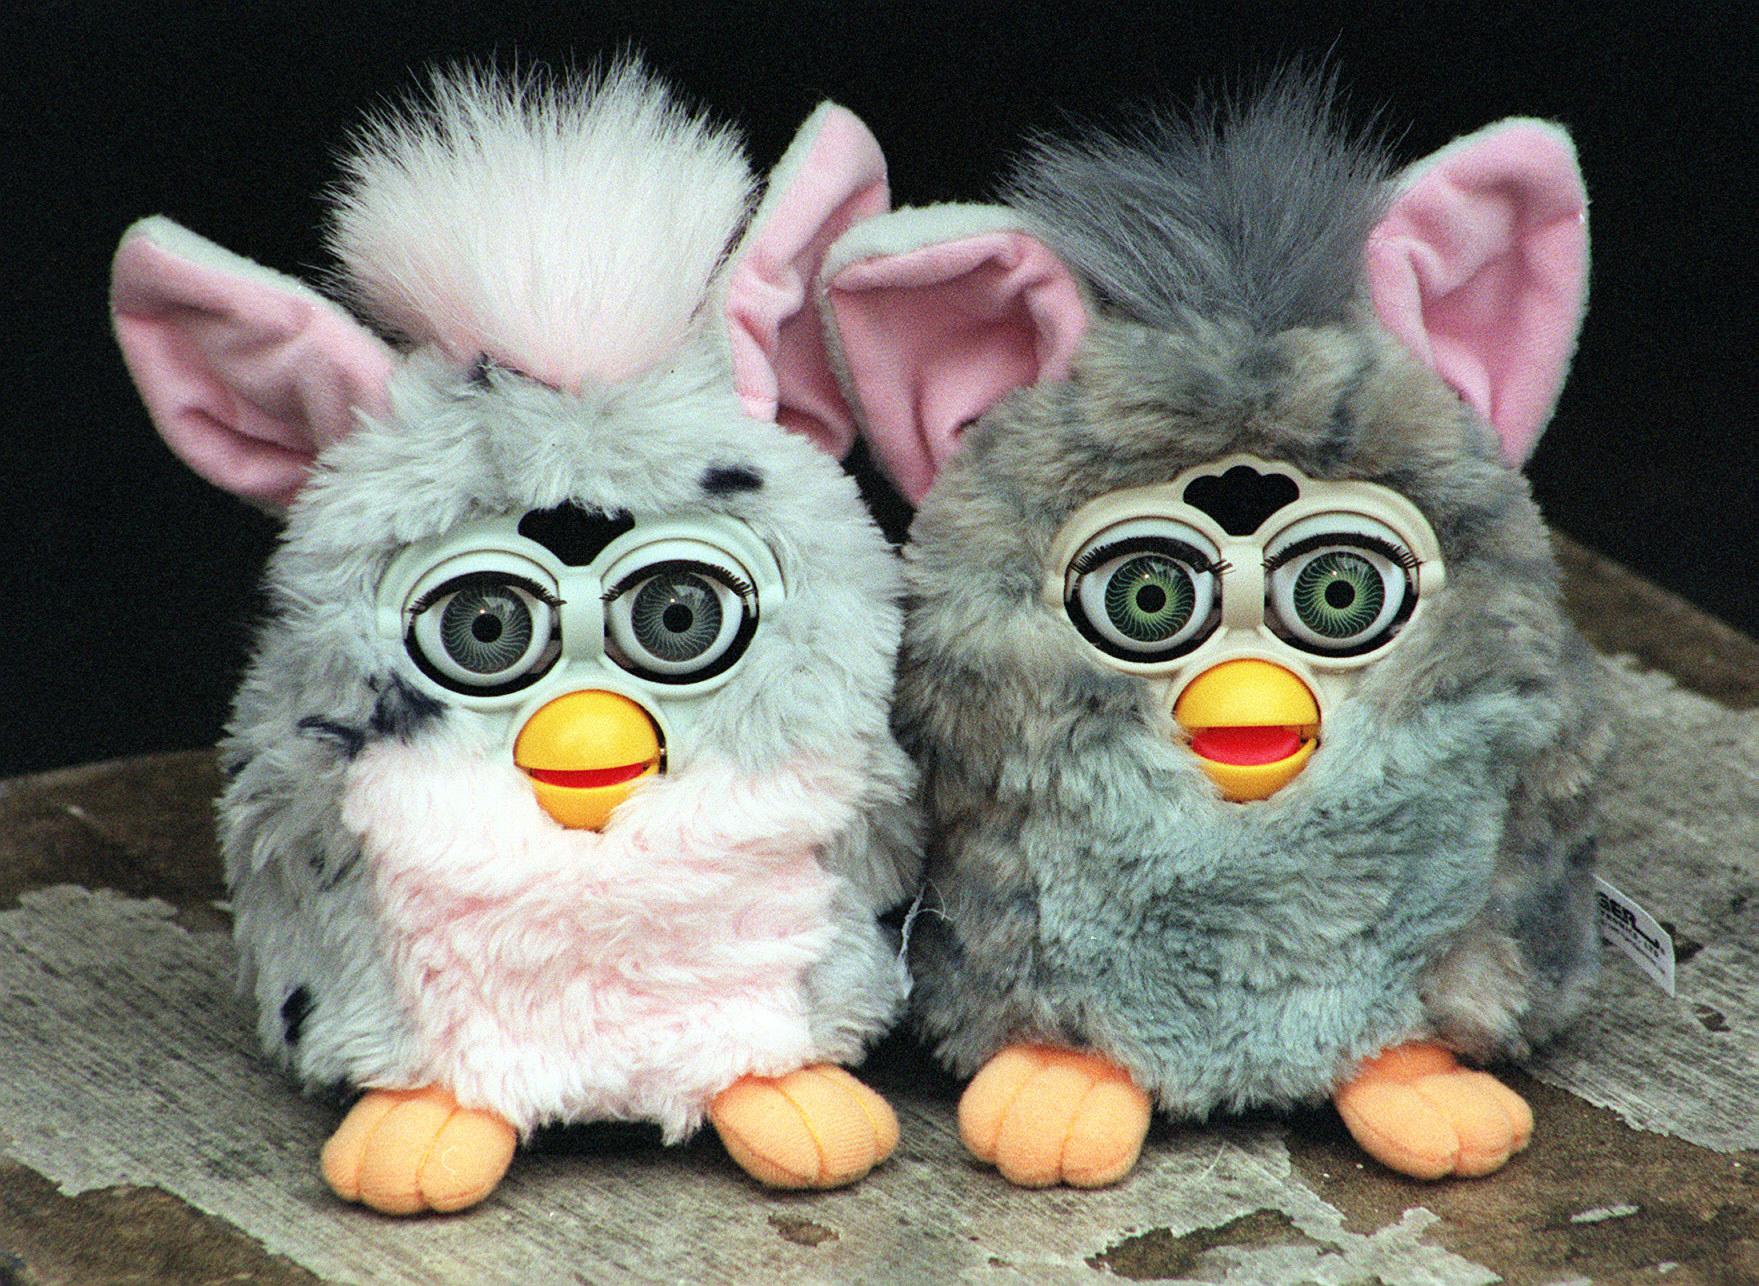 Two grey Furbies set on worn table